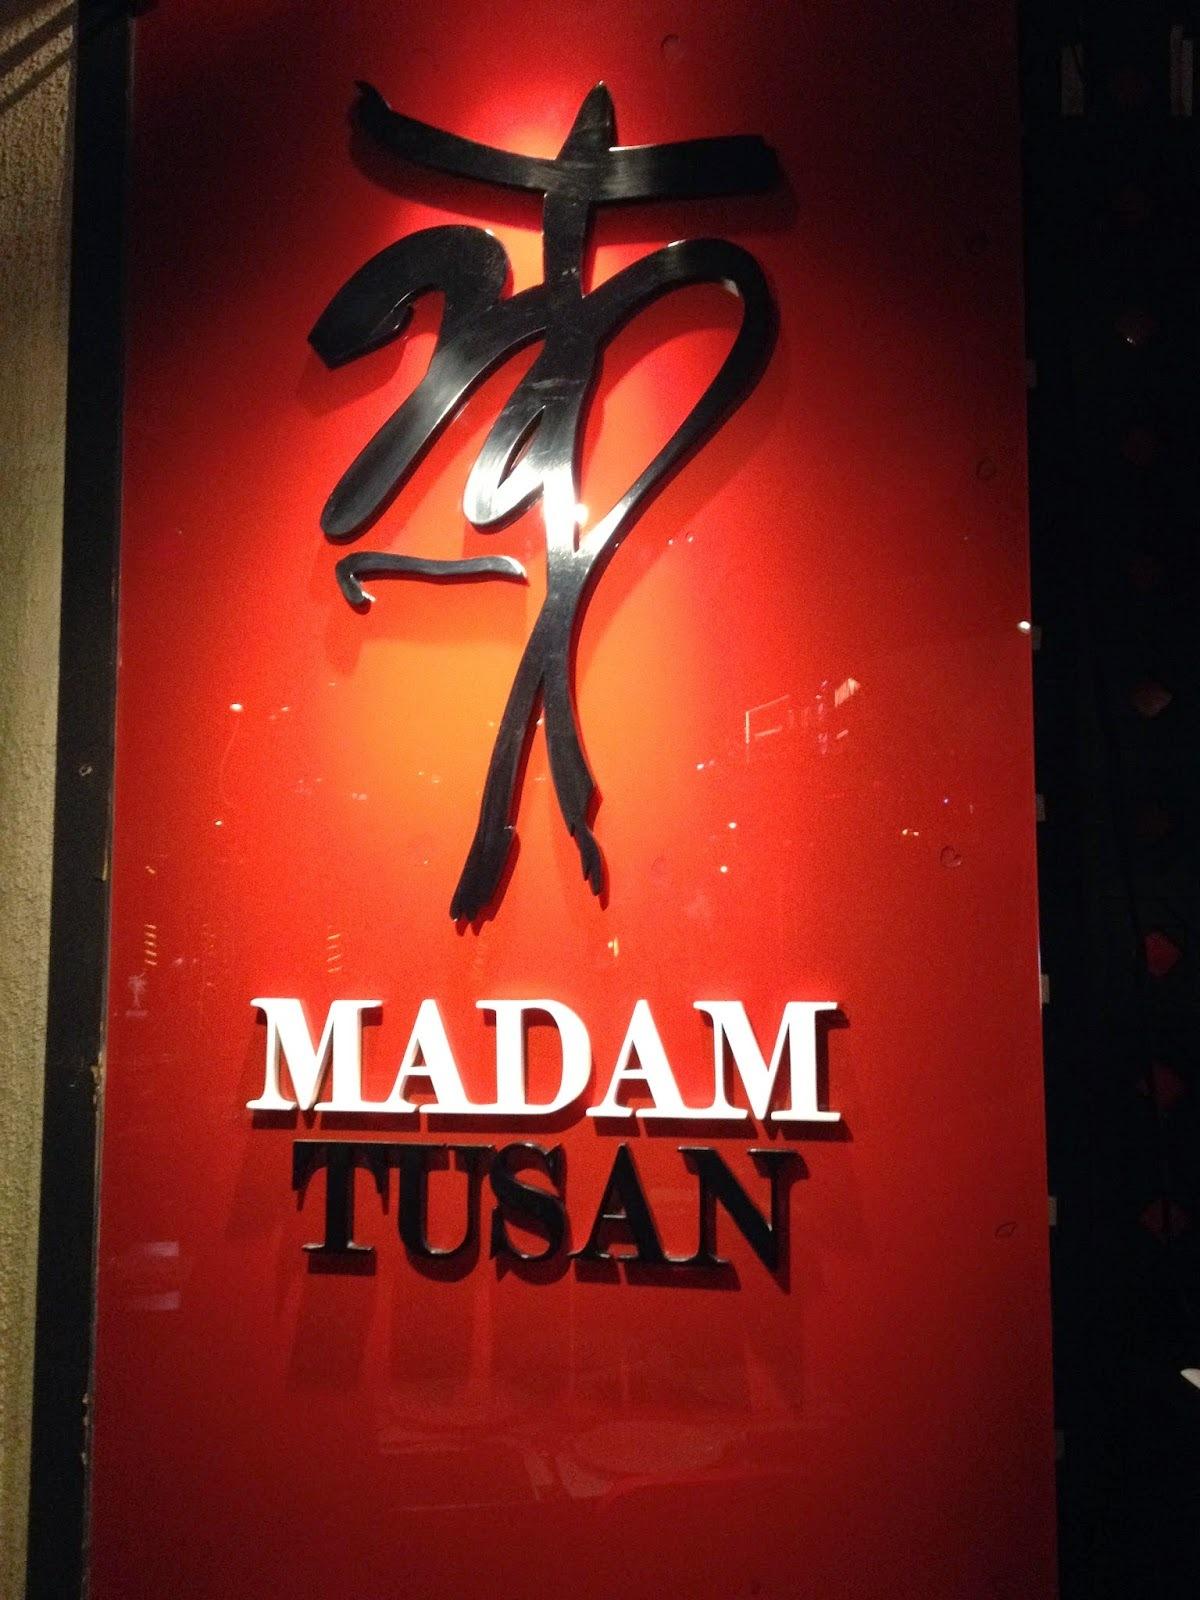 Madam Tusan: Perfecto!